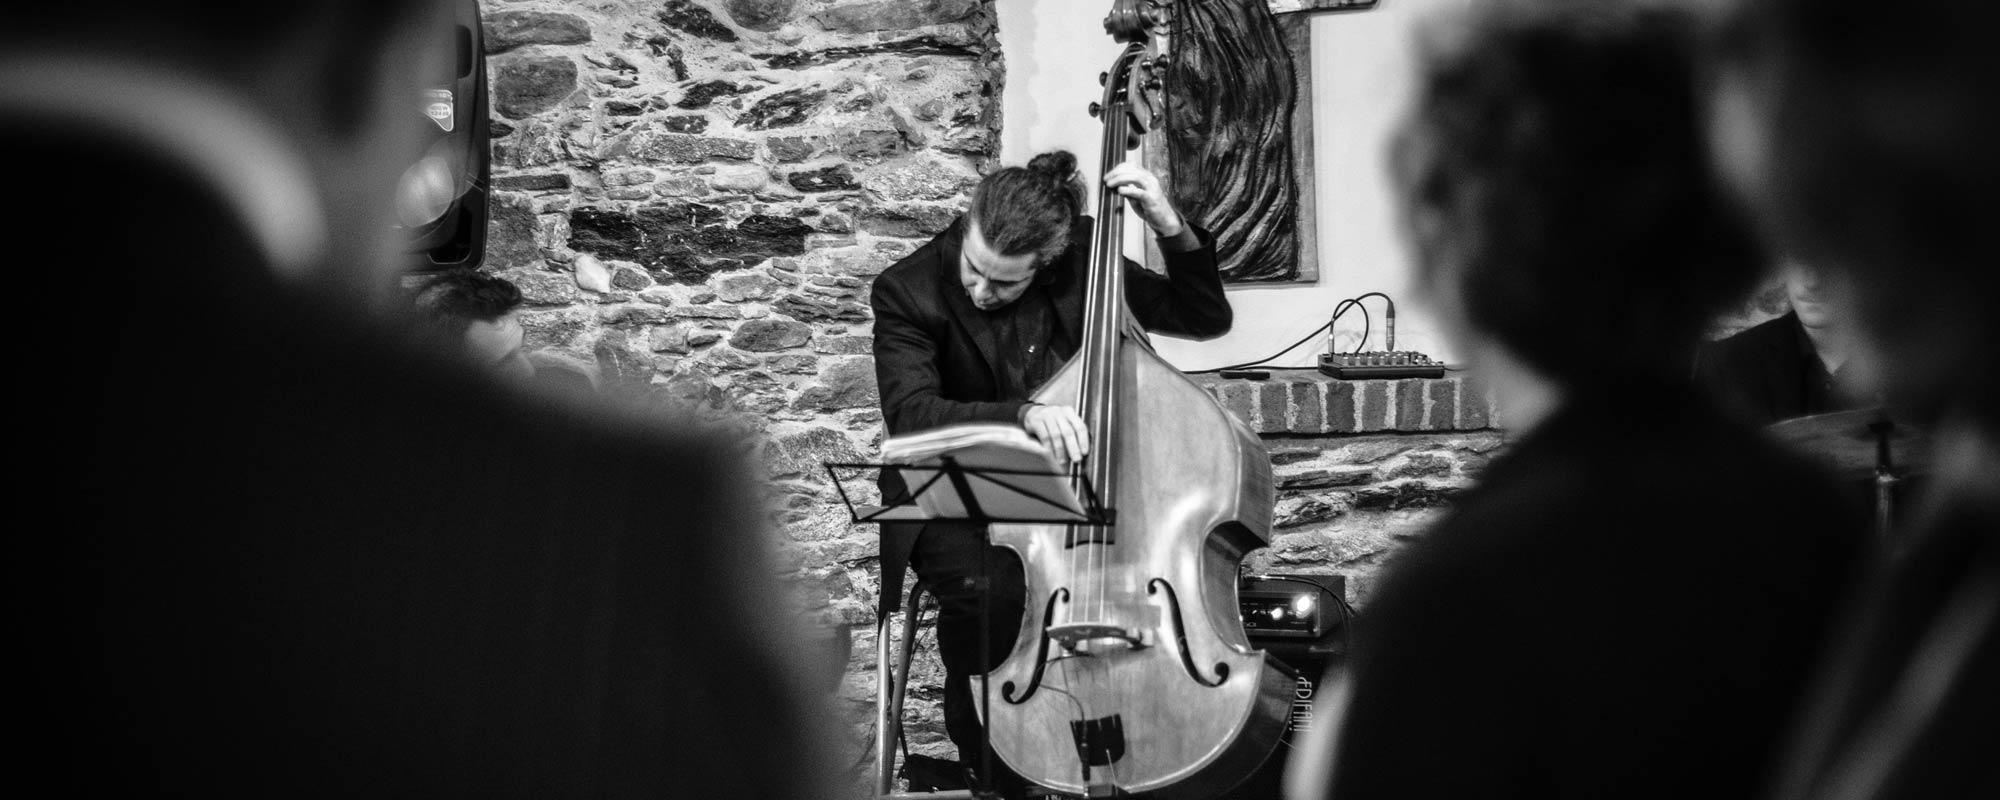 Matrimonio In Jazz : Naima jazz musica per il tuo matrimonio